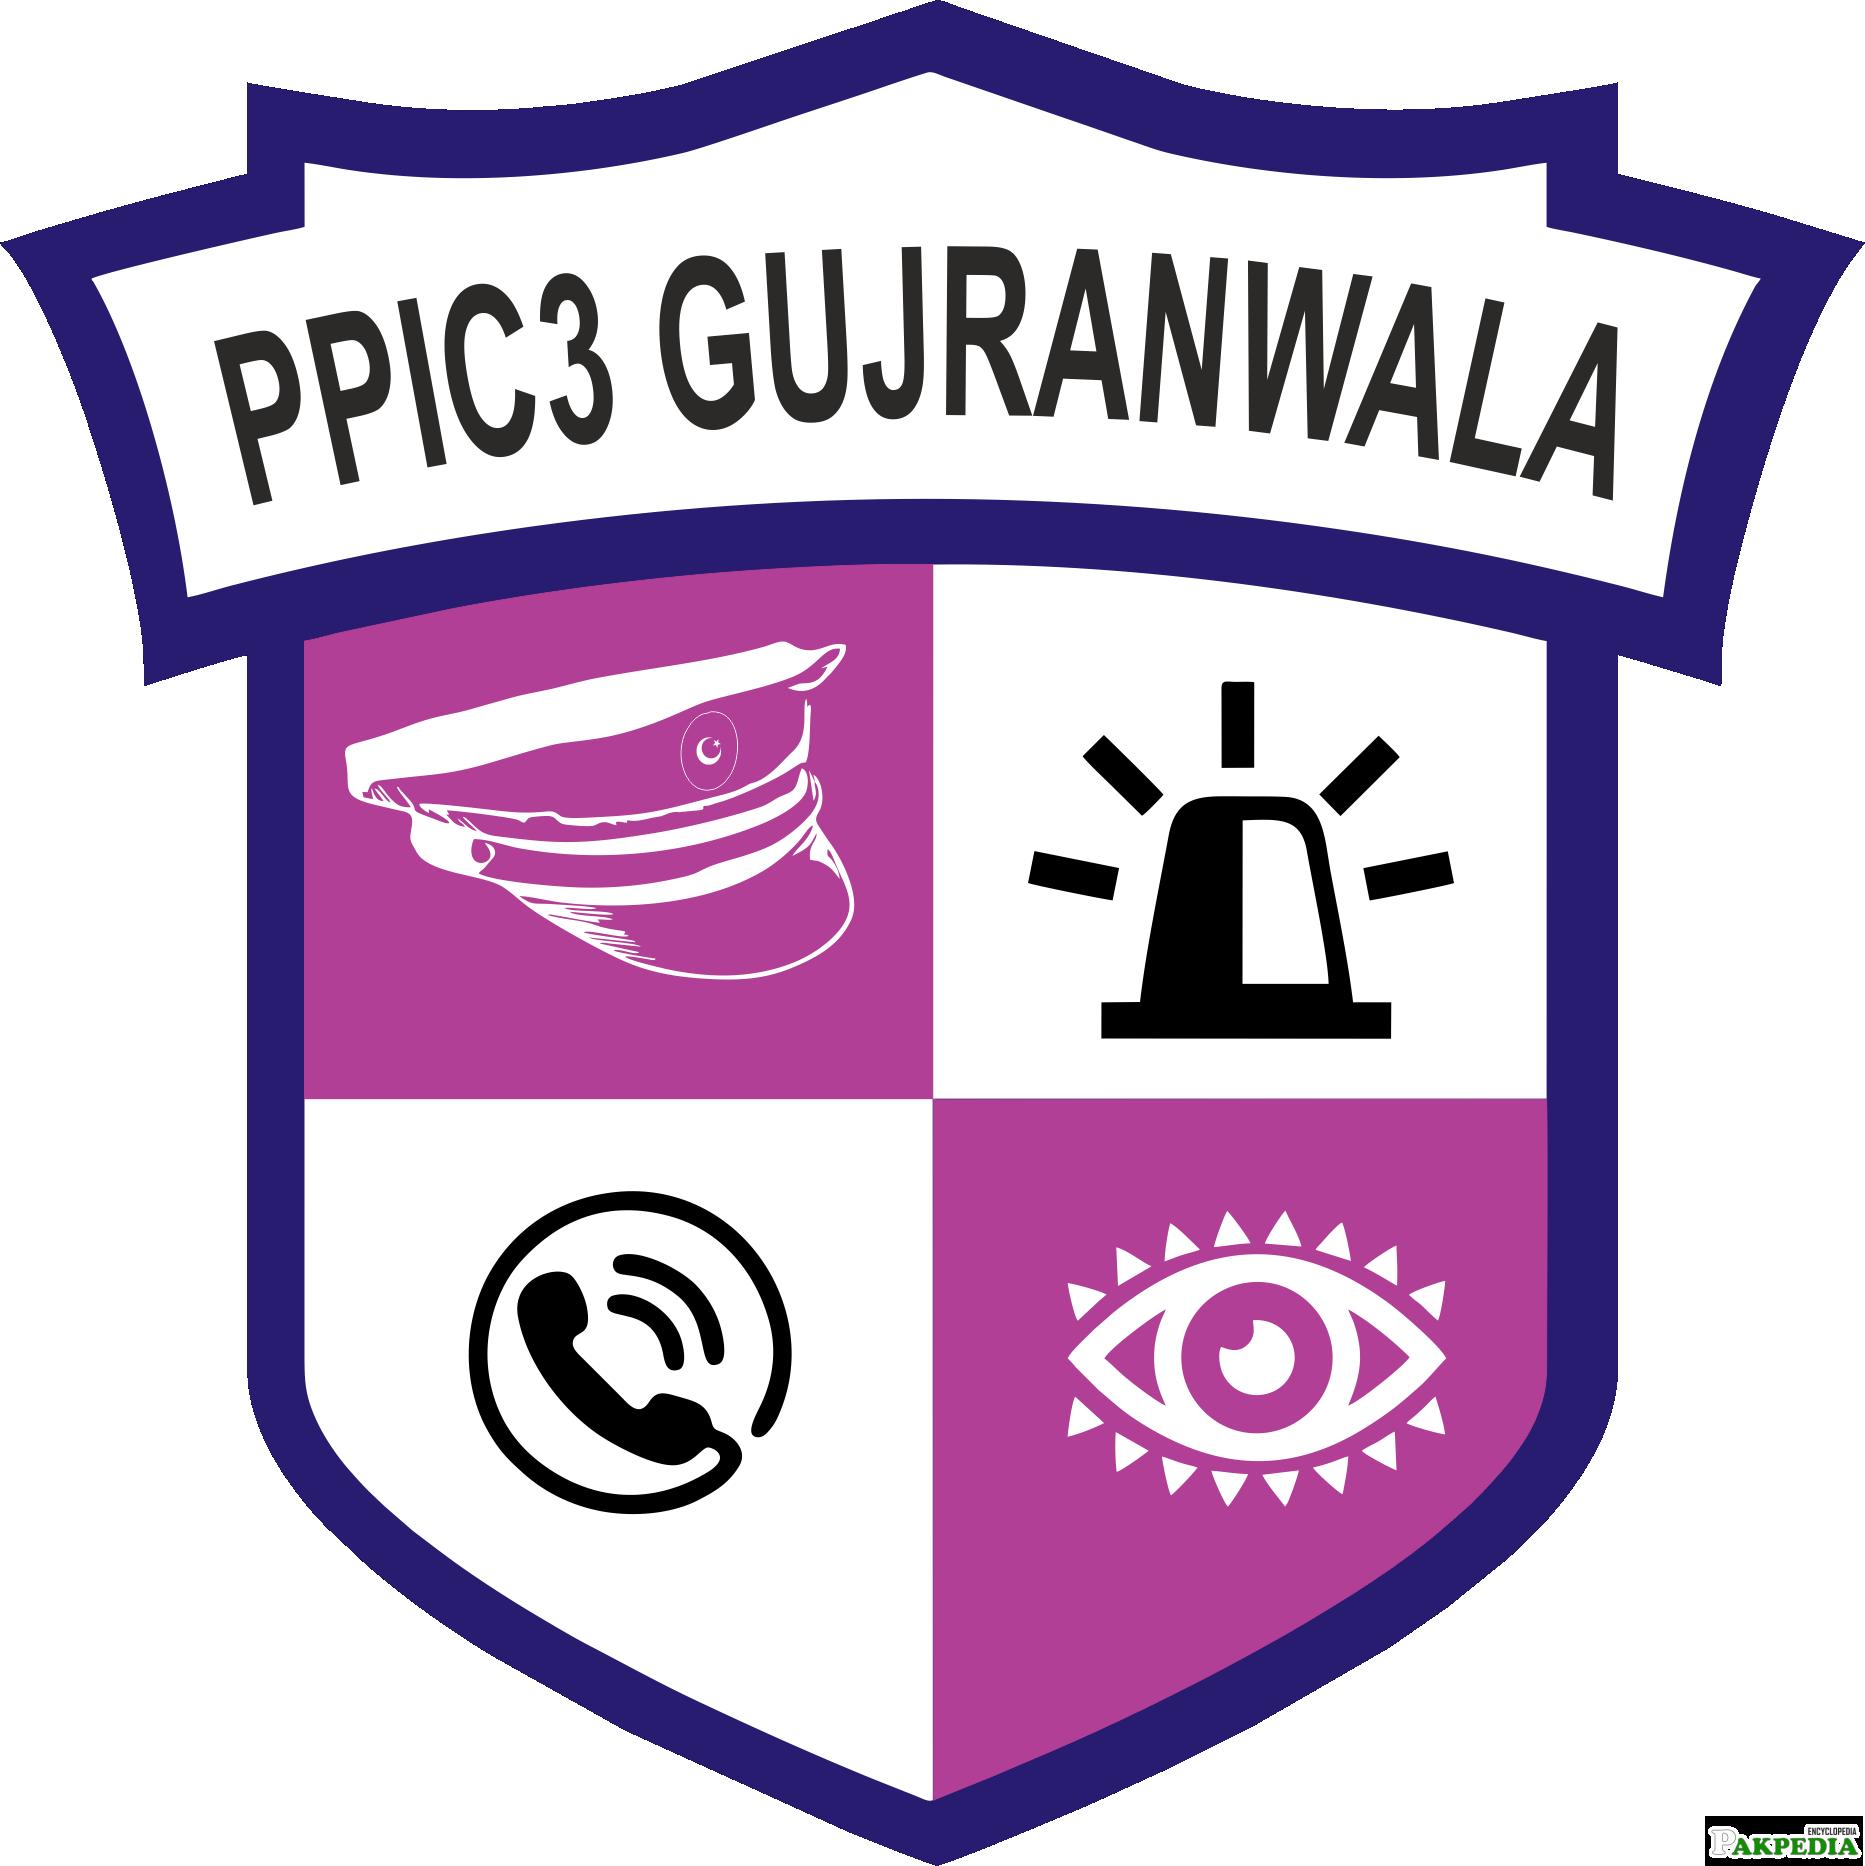 Logos of PSCA Gujranwala